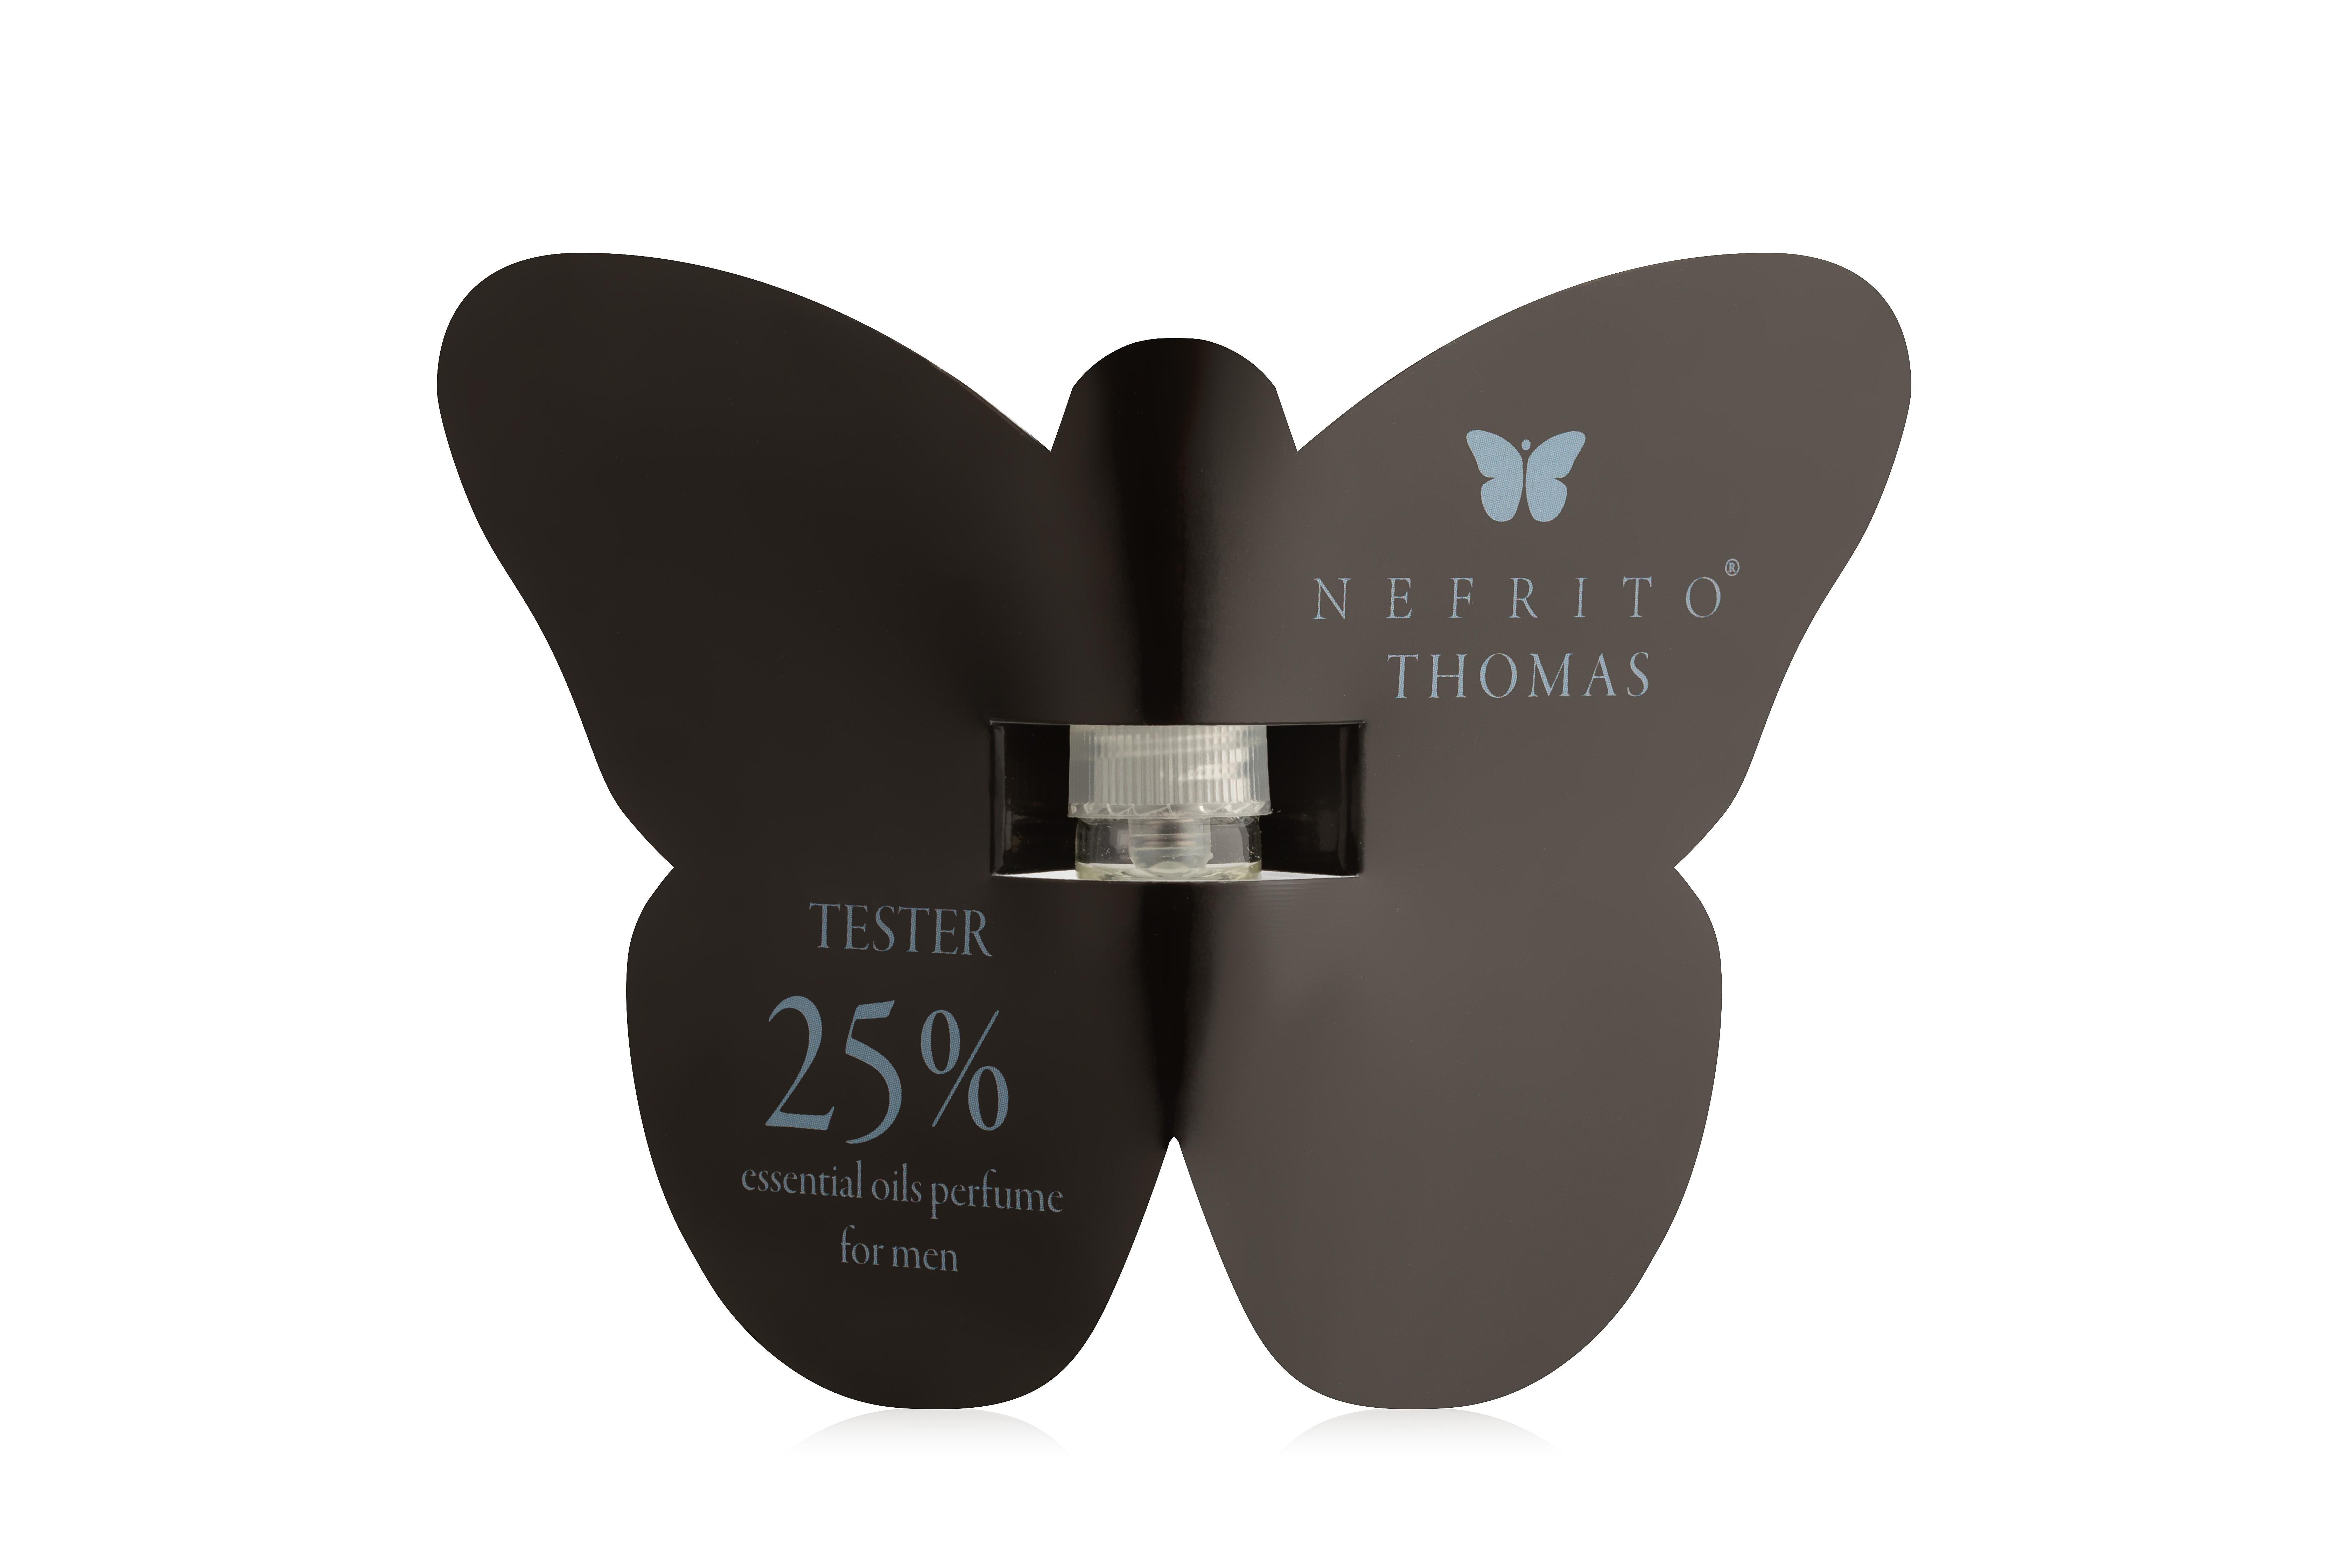 nefrito-butterfly-outside-thomas